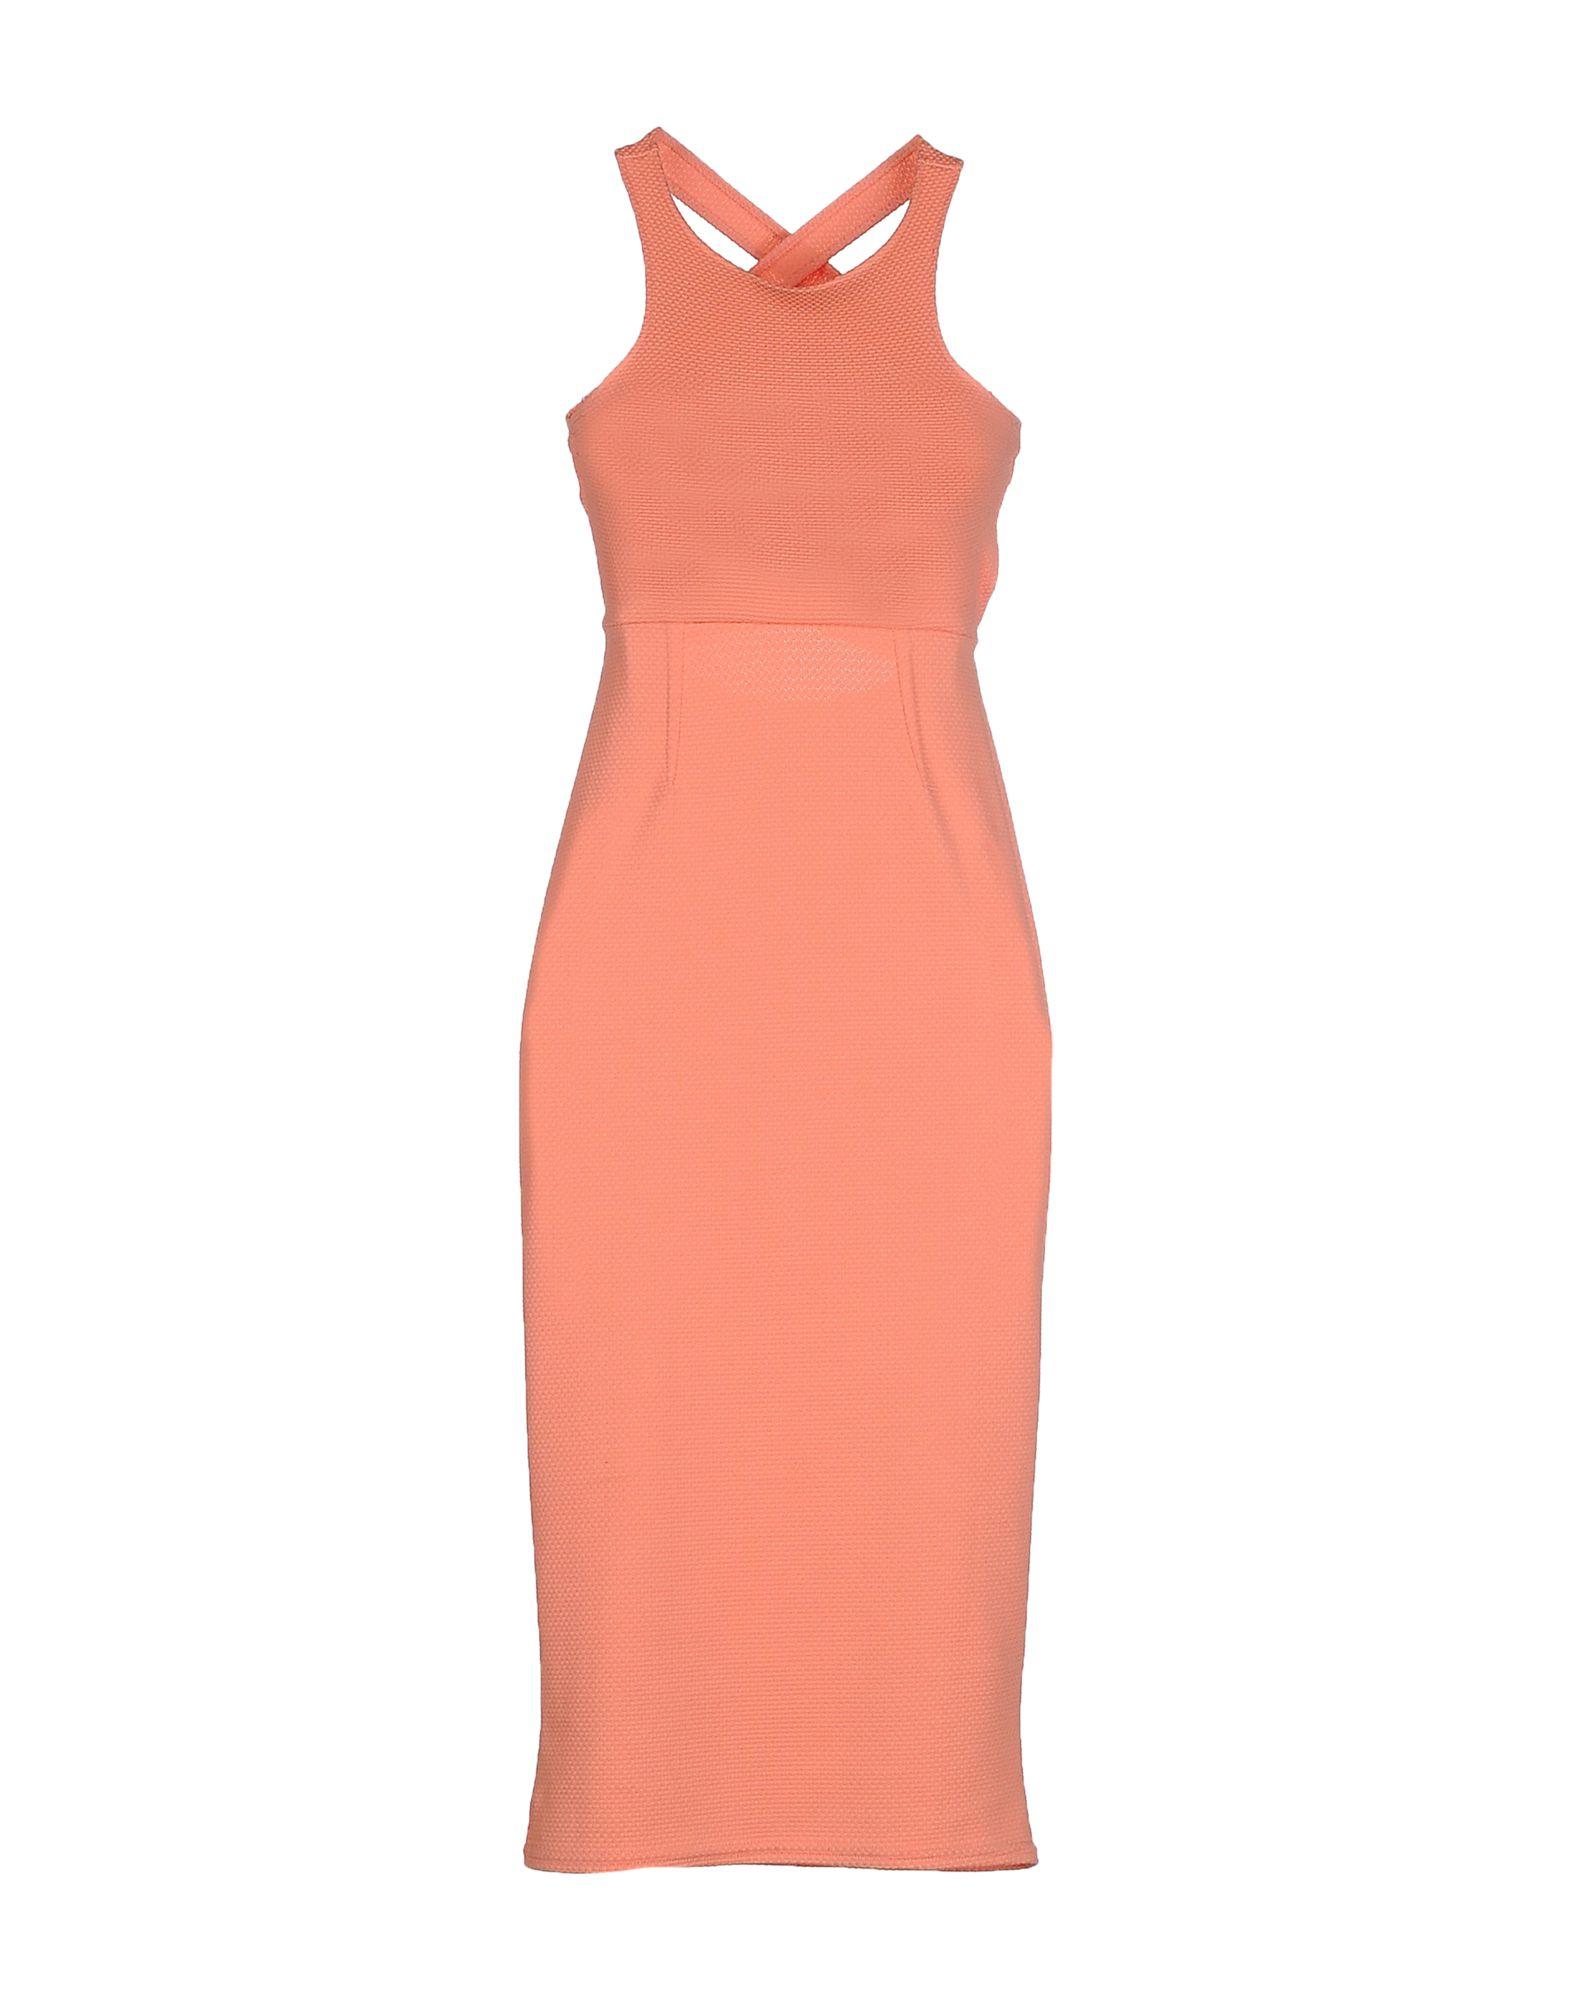 OH MY LOVE Платье длиной 3/4 платье quelle my style 1003975 page 4